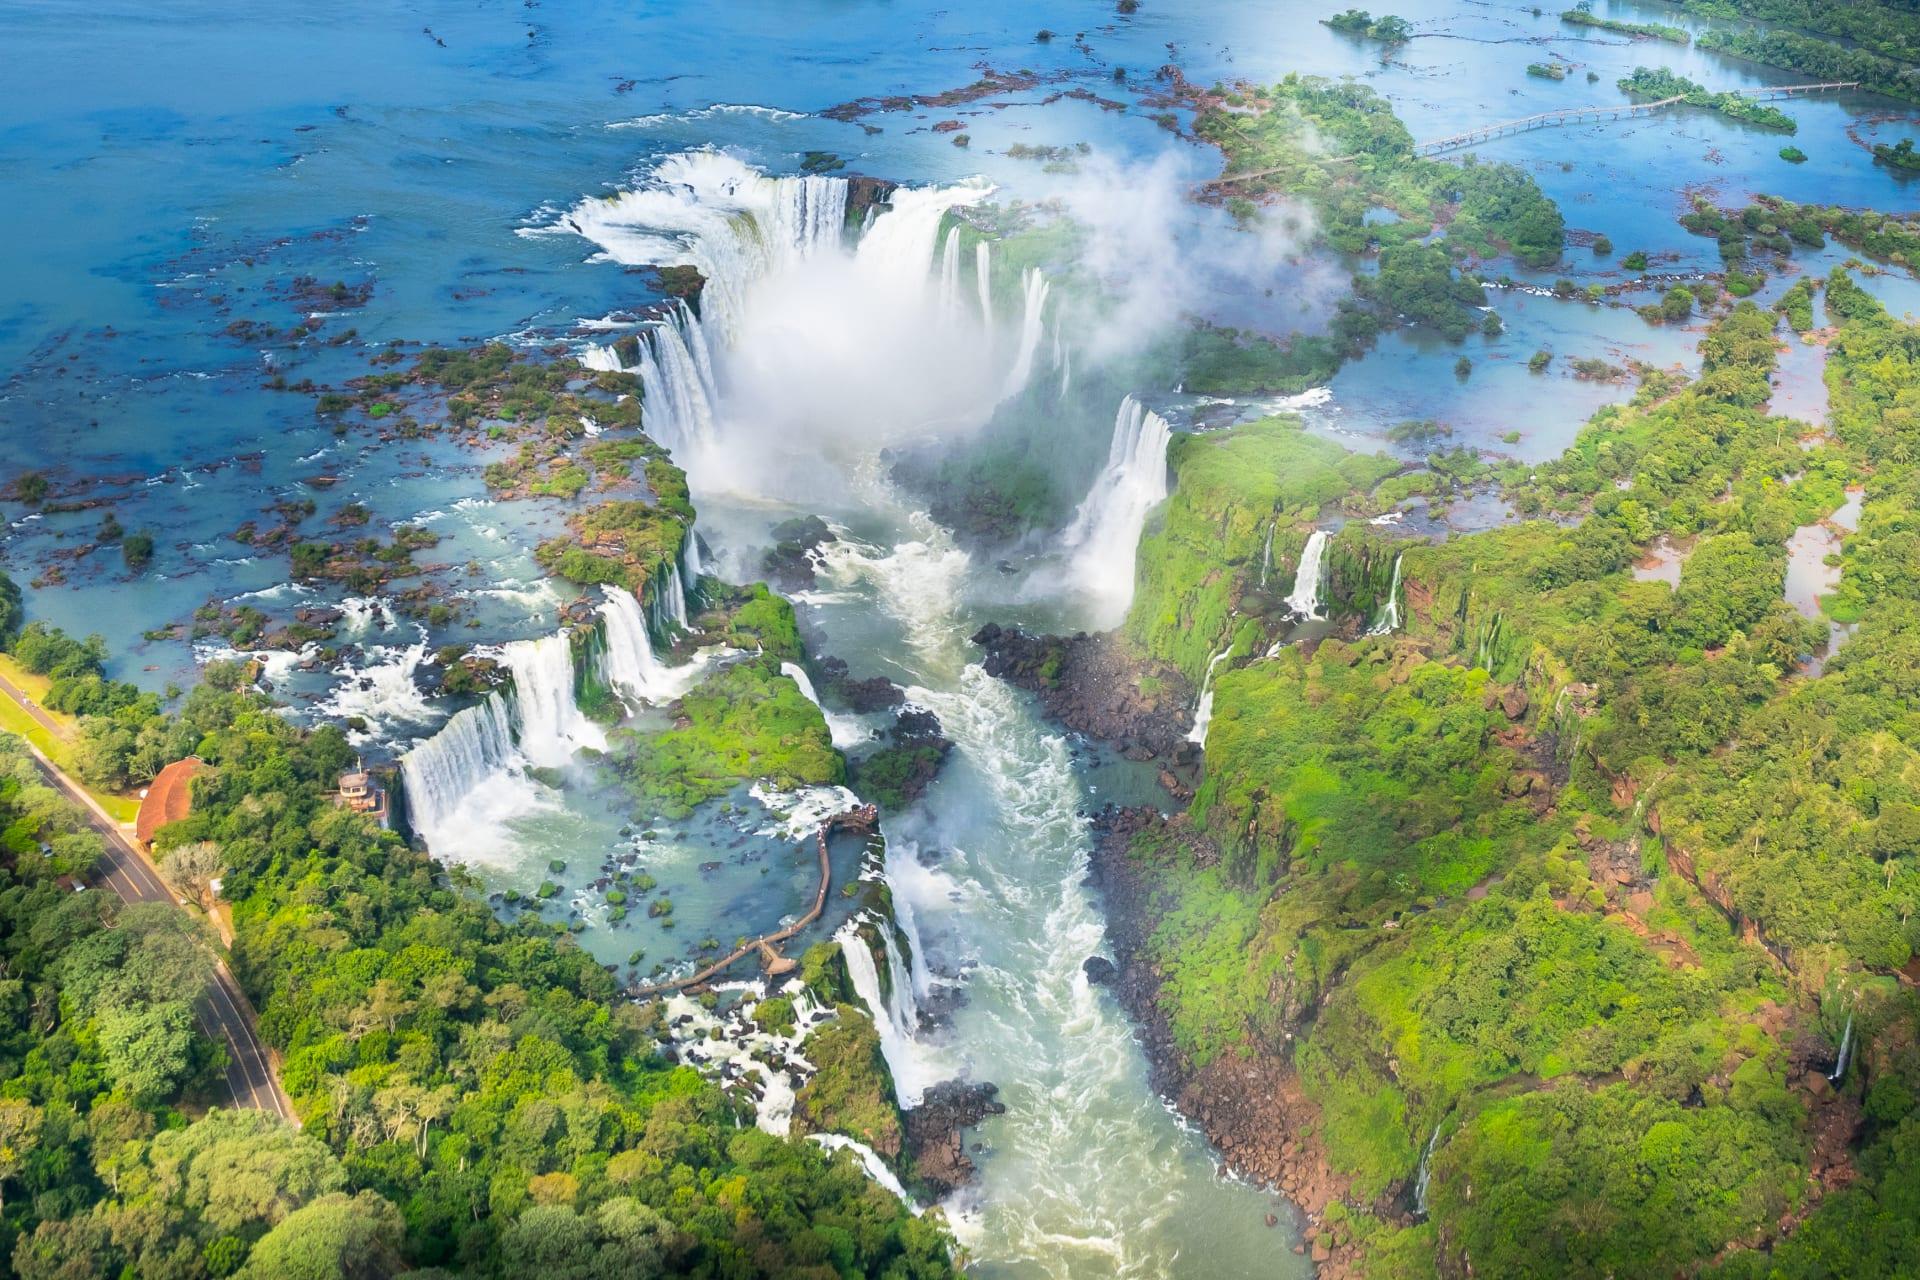 Iguazu Falls cover image